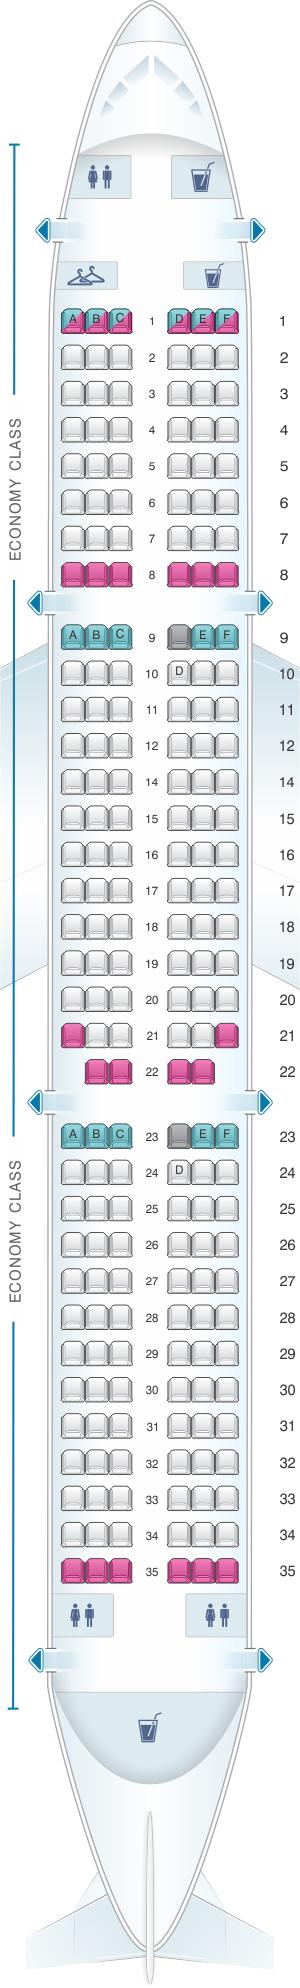 Seat map for Air France Airbus A321 Metropolitan V1